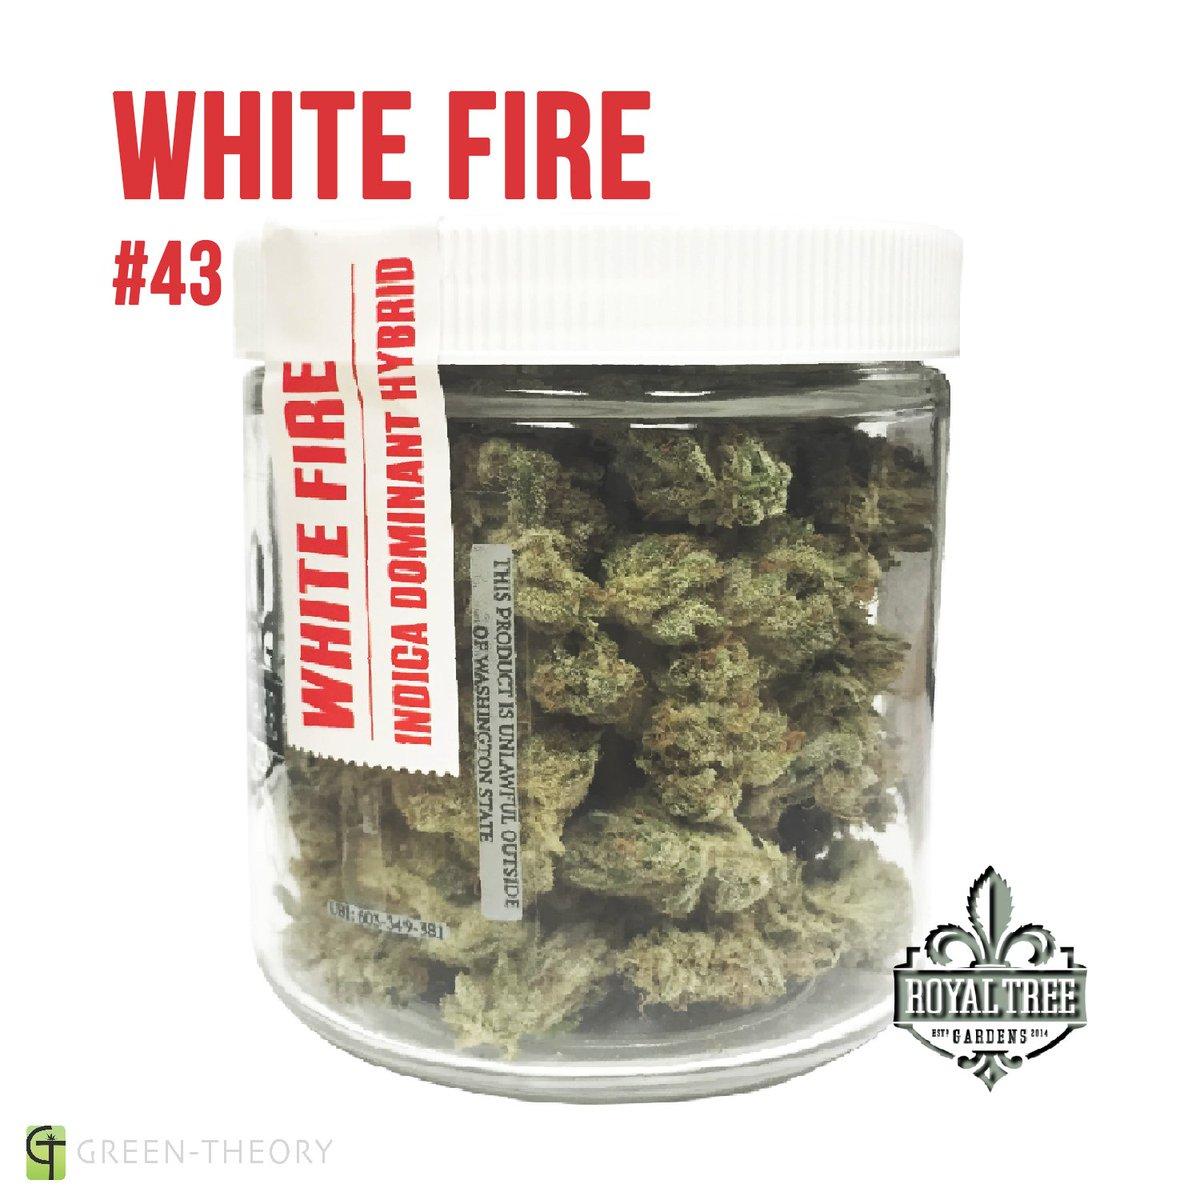 whitefire43 hashtag on Twitter